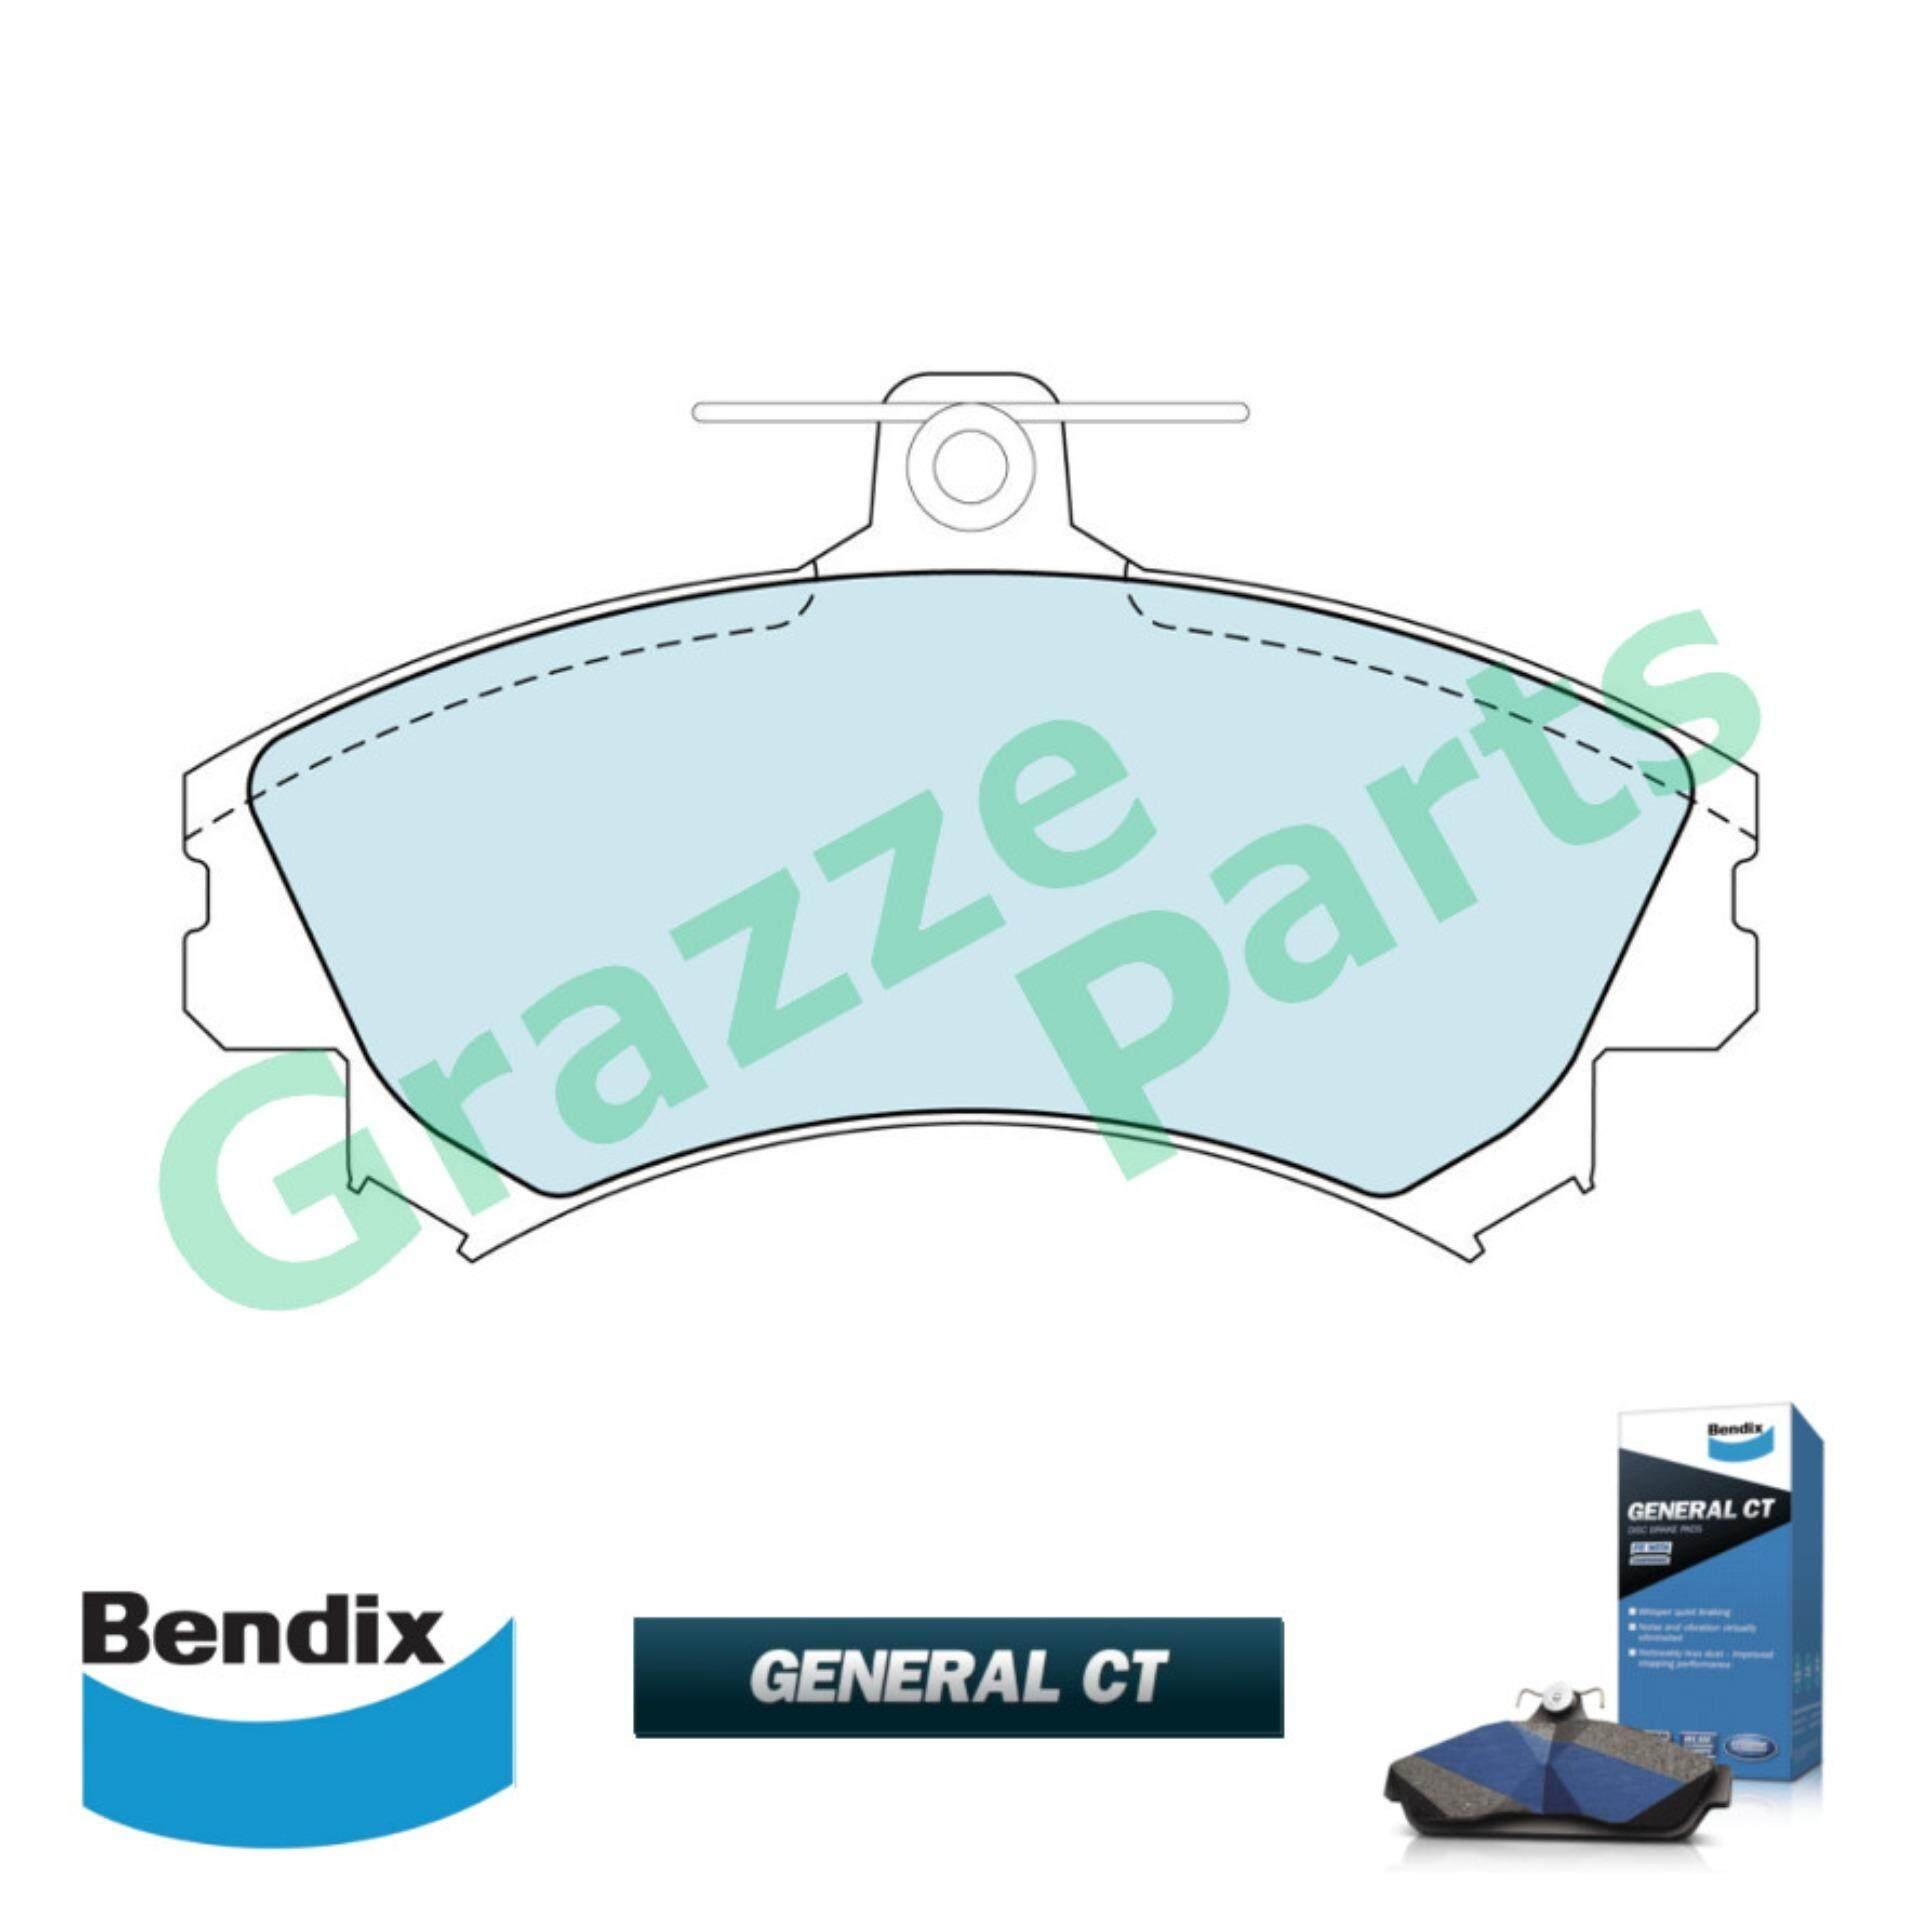 Bendix General CT Disc Brake Pad Front for DB1402 - Proton Waja 1.6 Perodua Alza 2009-2012 Volvo S40 Smart For 4